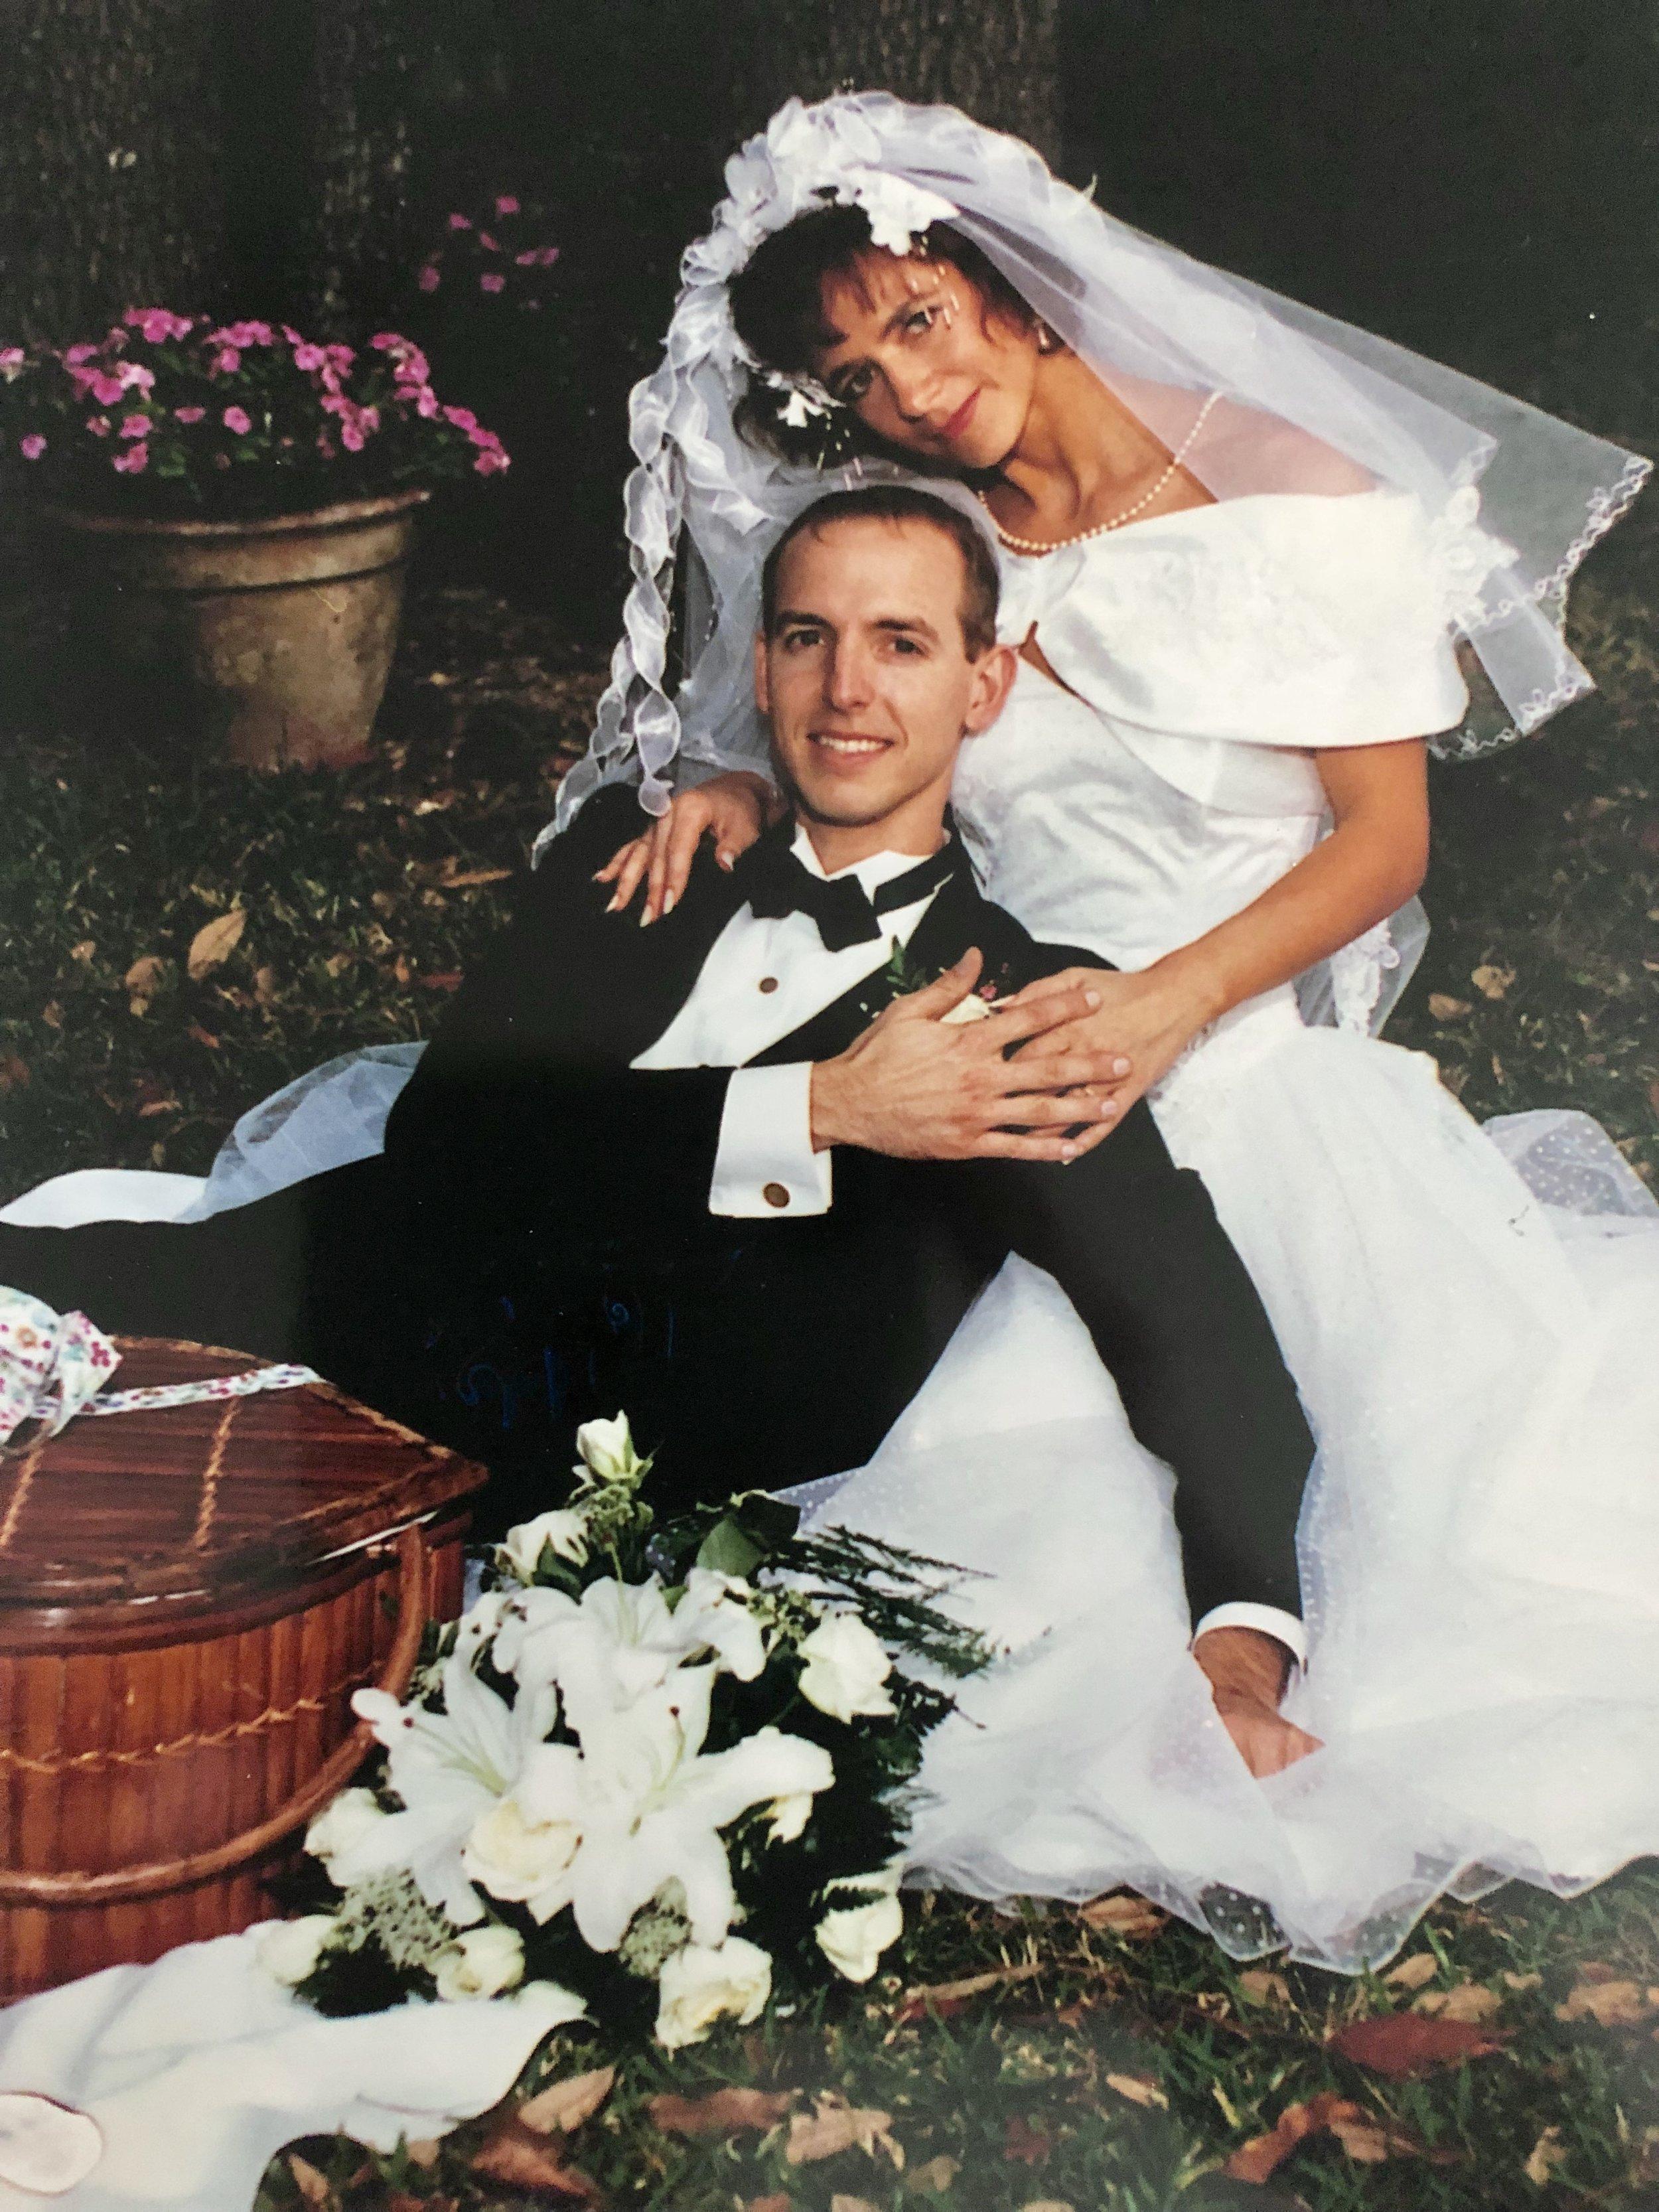 Wedding December 17, 1994